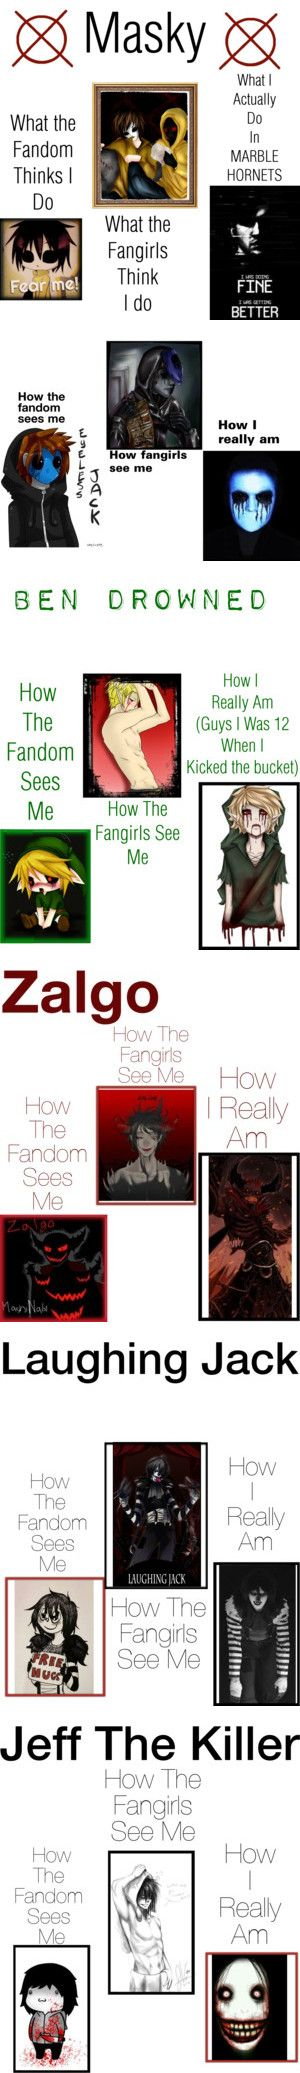 Creepypasta Memes by dragonladydoctor on Polyvore featuring art and creepypasta